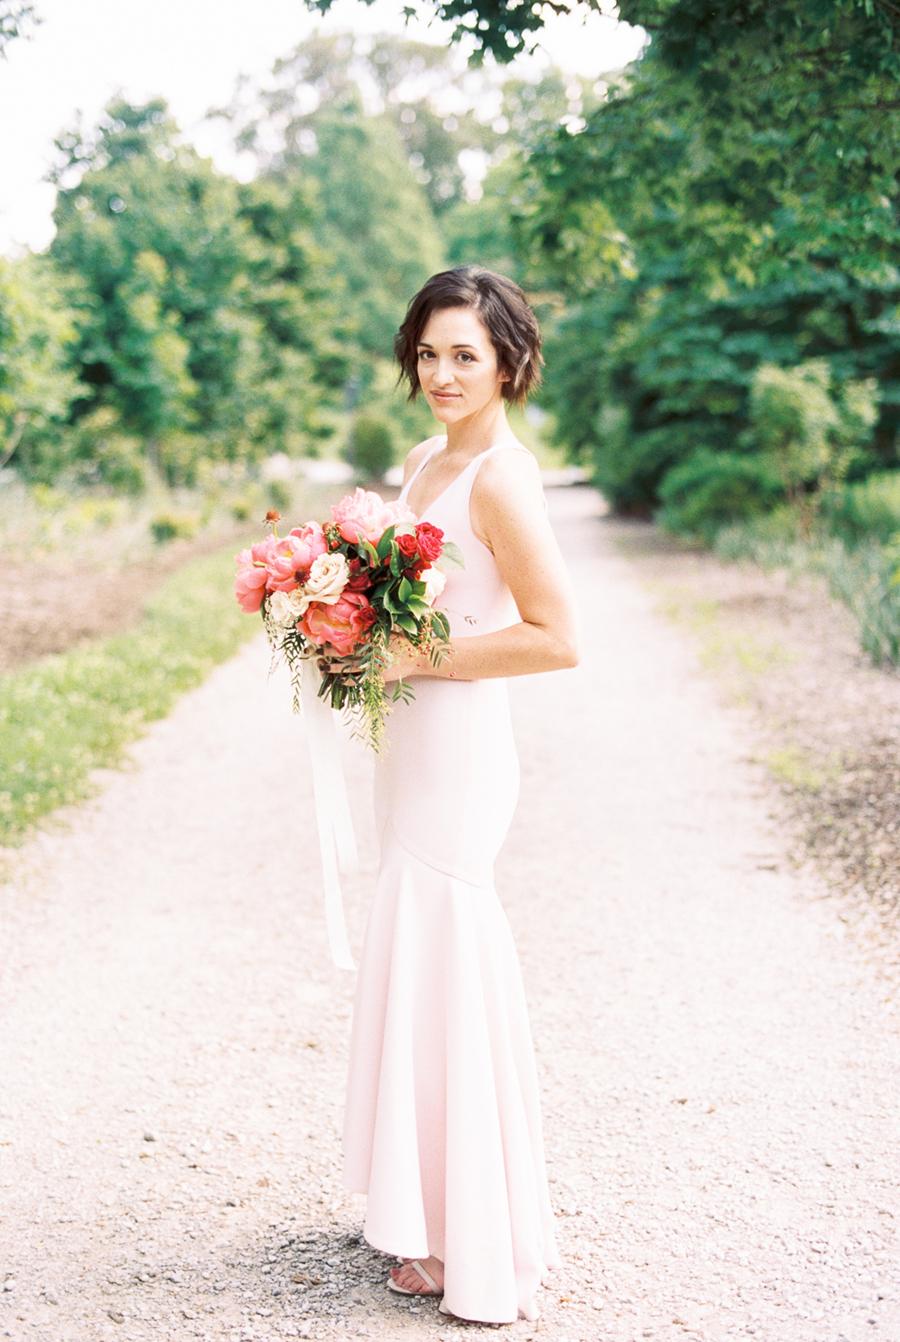 Columbus_Cincinnati_Chicago_Dayton_Fine_Art_Film_Wedding_Photographer-57.jpg